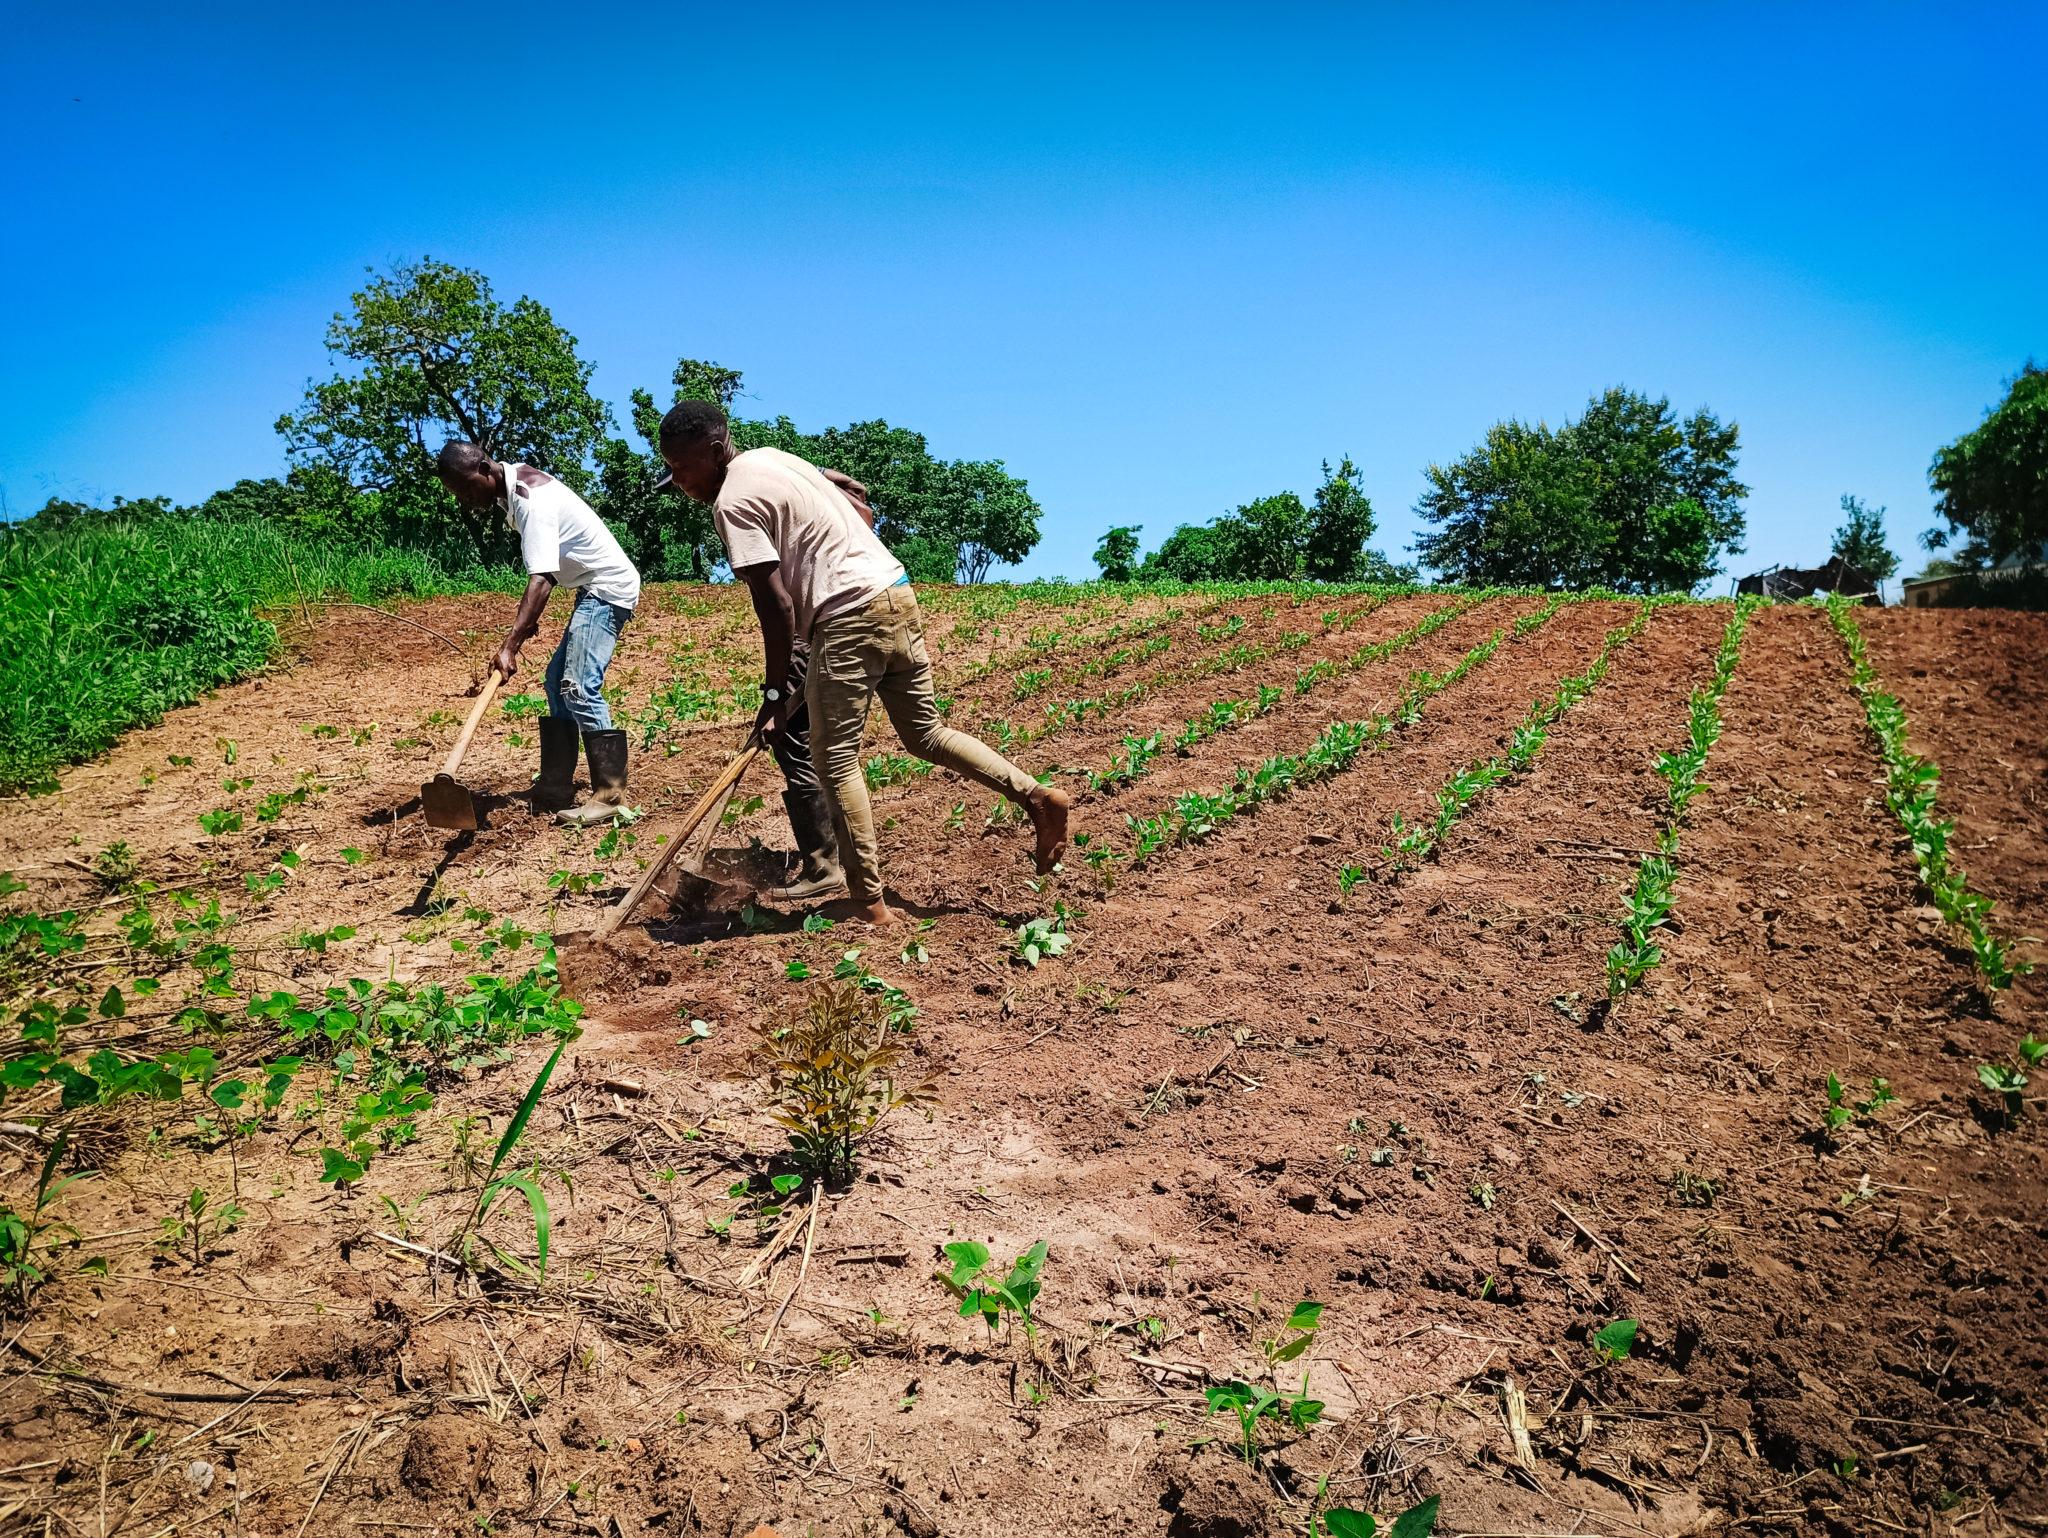 Three Mozambican men work a field